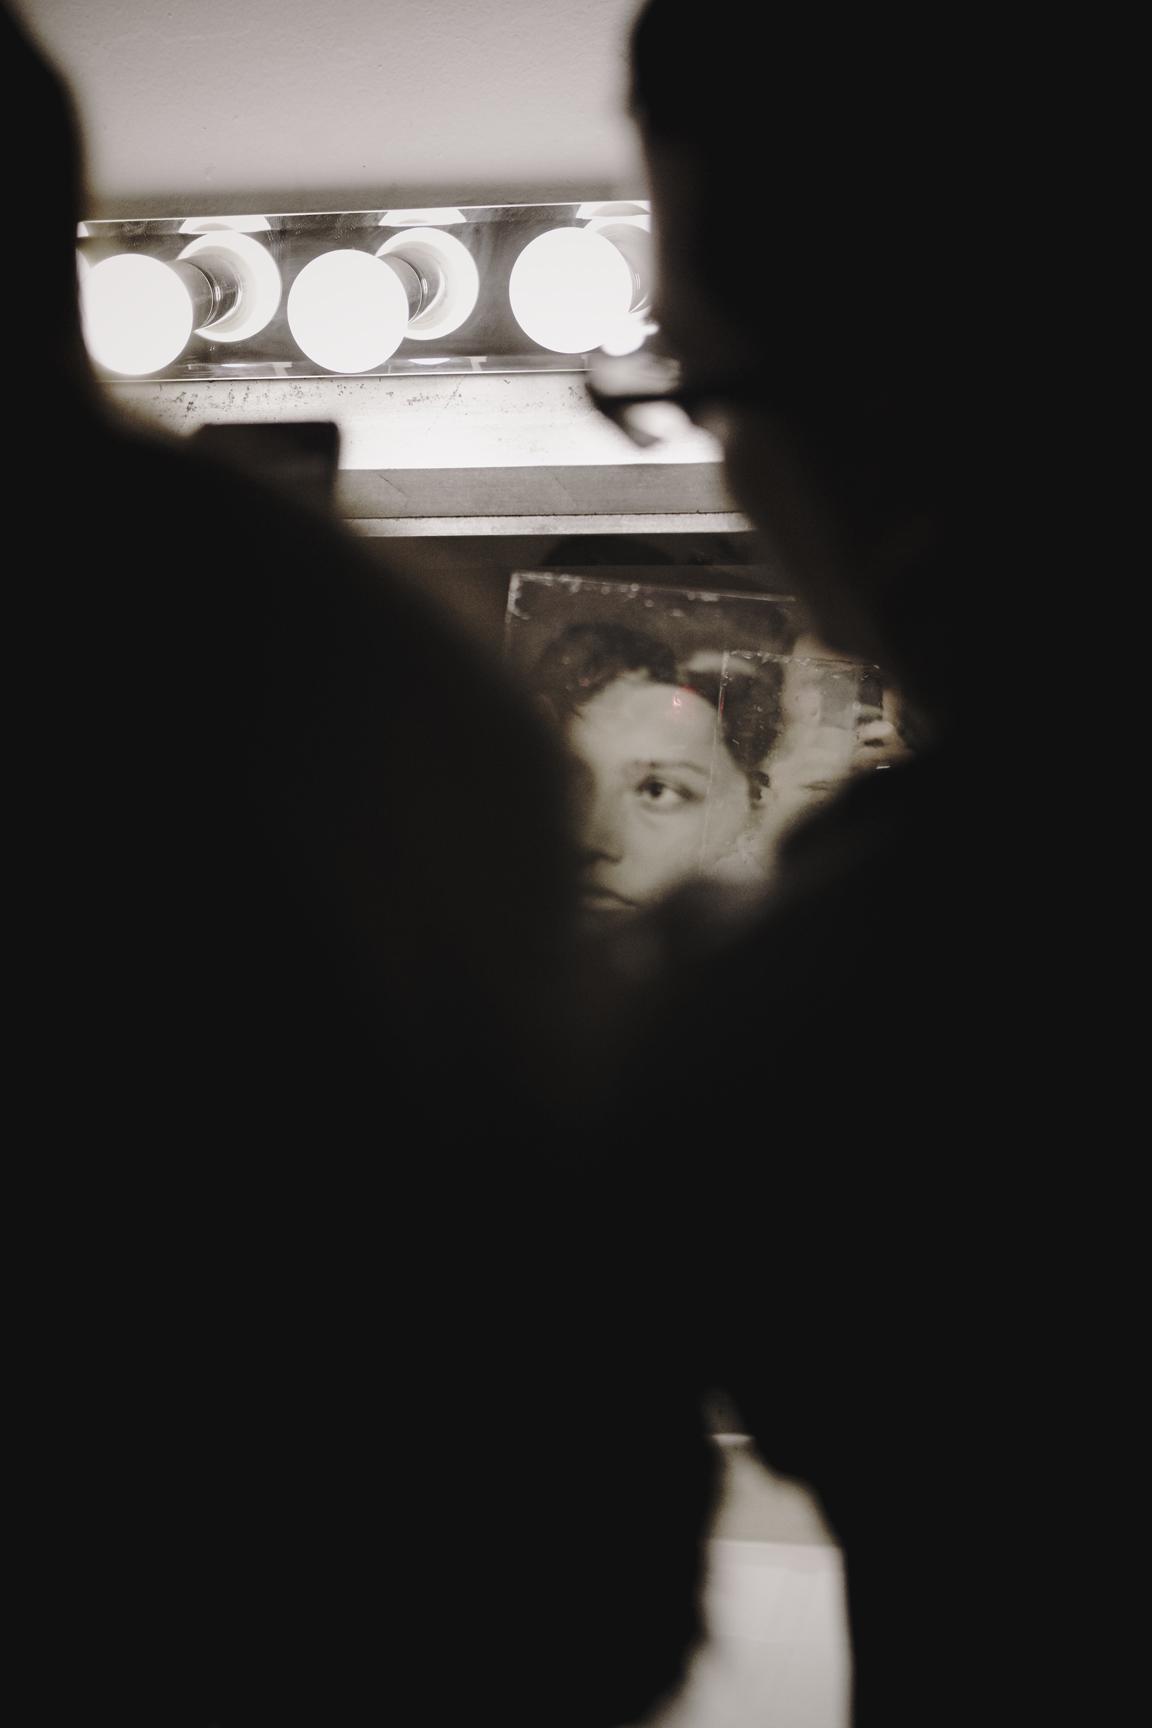 JAMES-WEBER-PHOTOGRAPHER-wetplate-collodion-13492.jpg